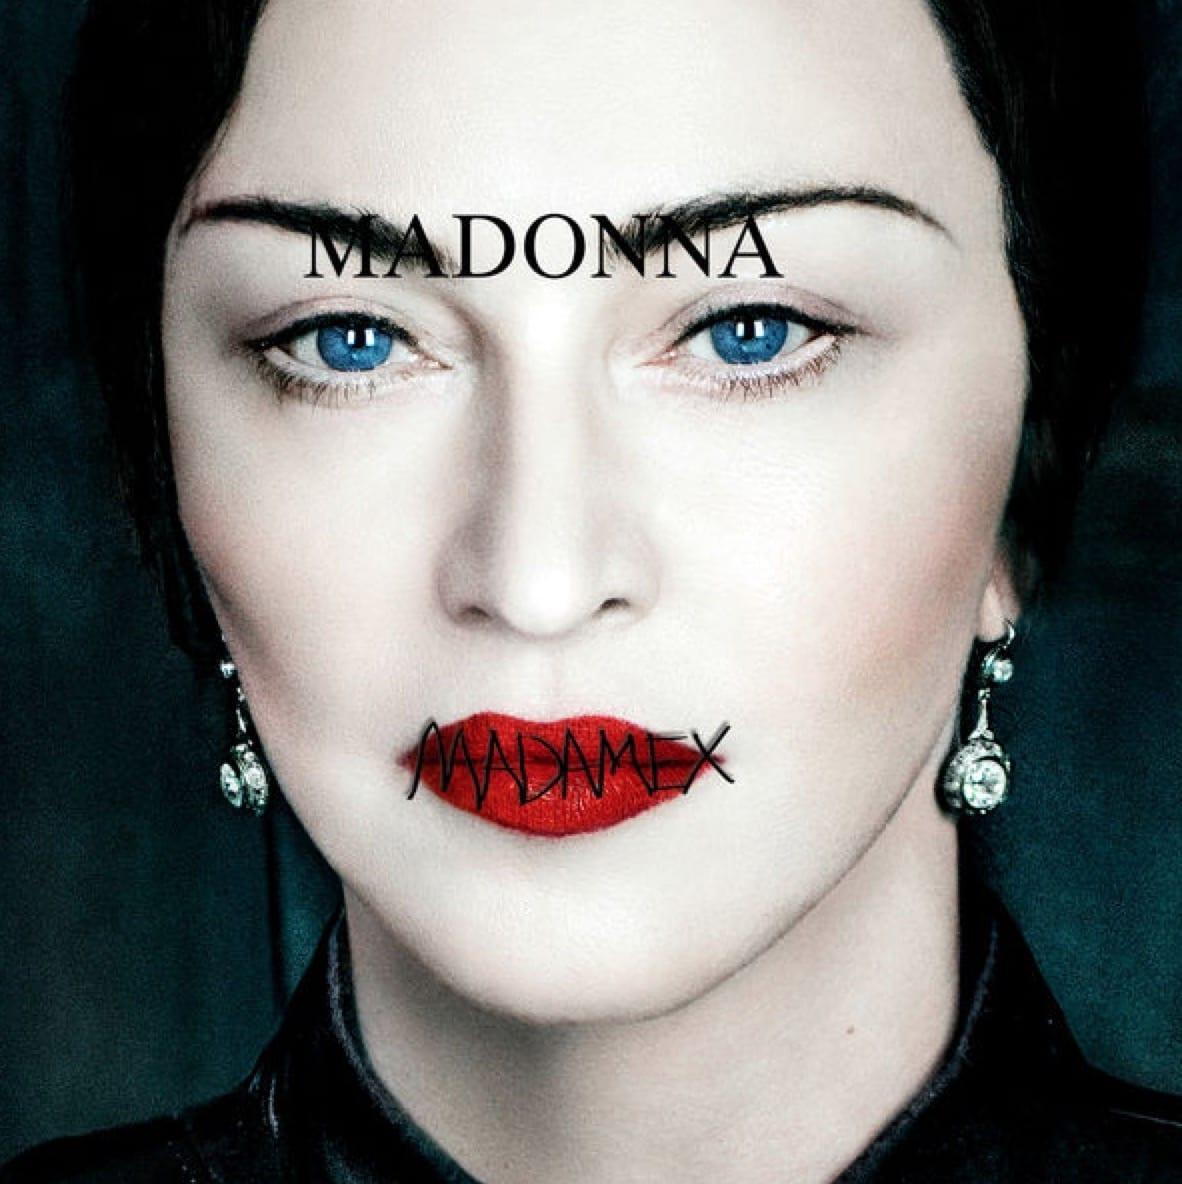 Madonna au Grand Rex de Paris